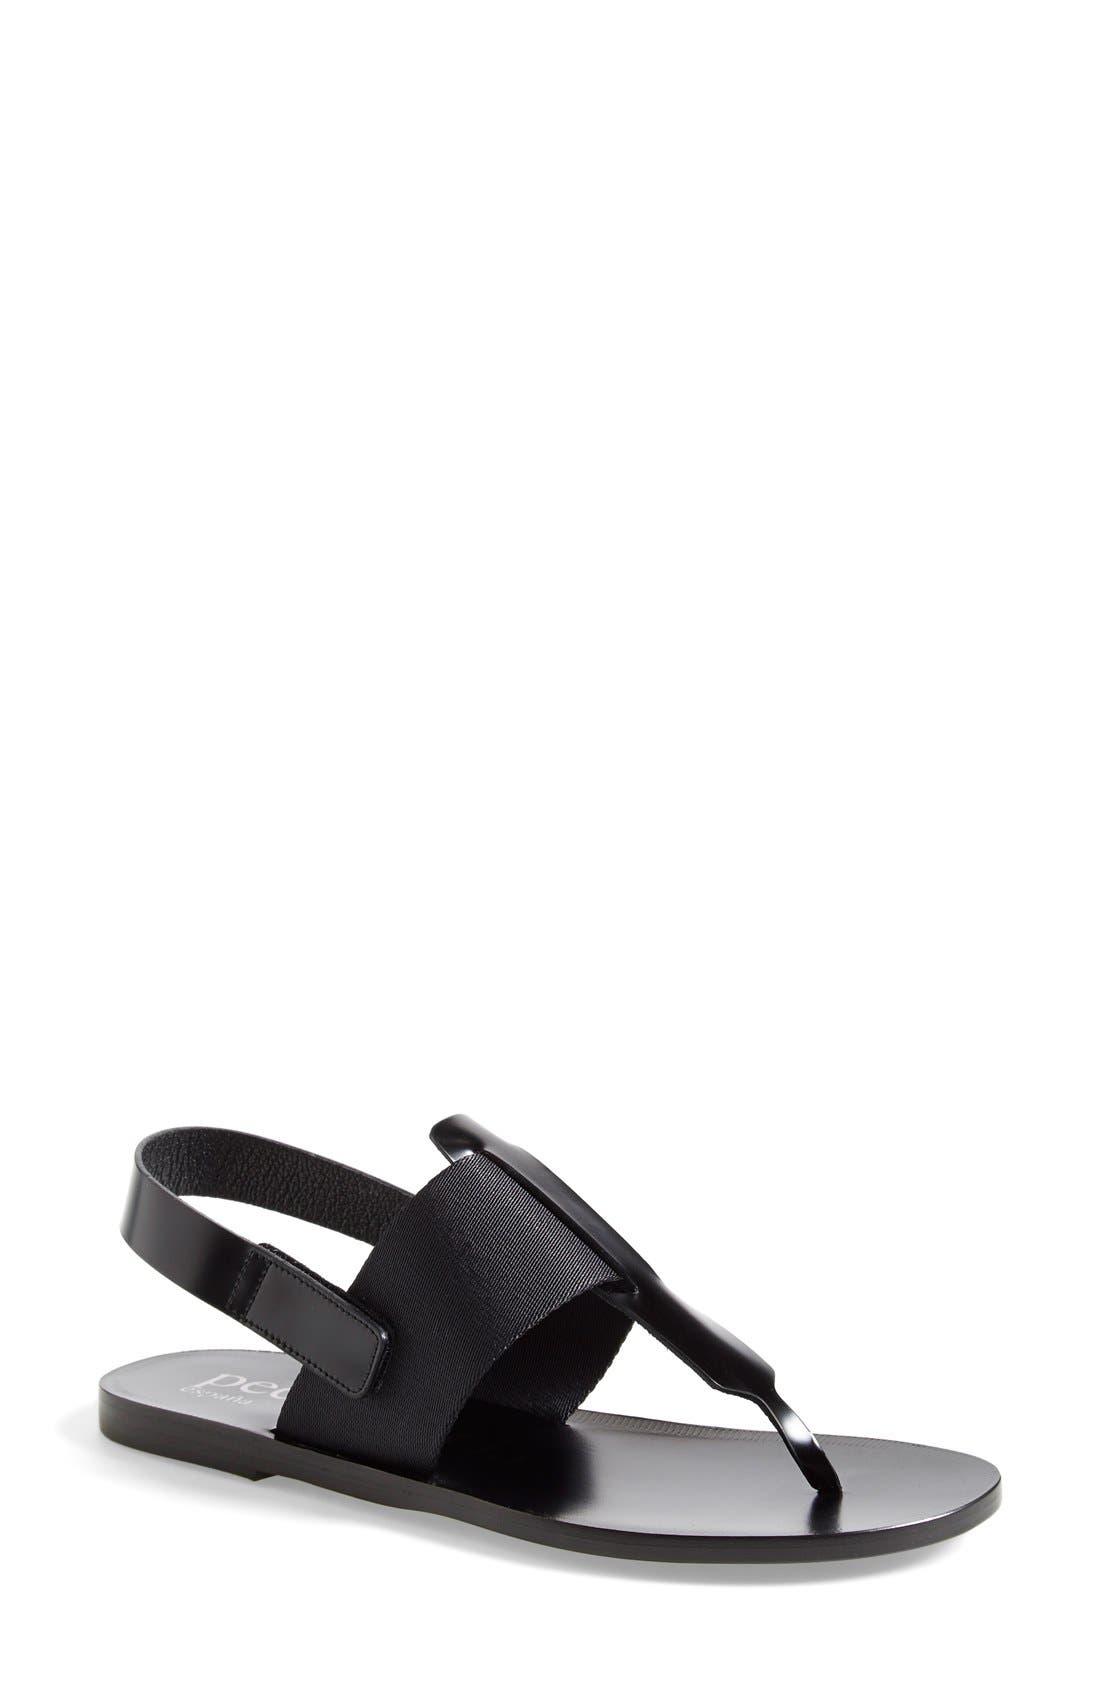 Main Image - Pedro Garcia 'Zula' Flat Slingback Sandal (Women)